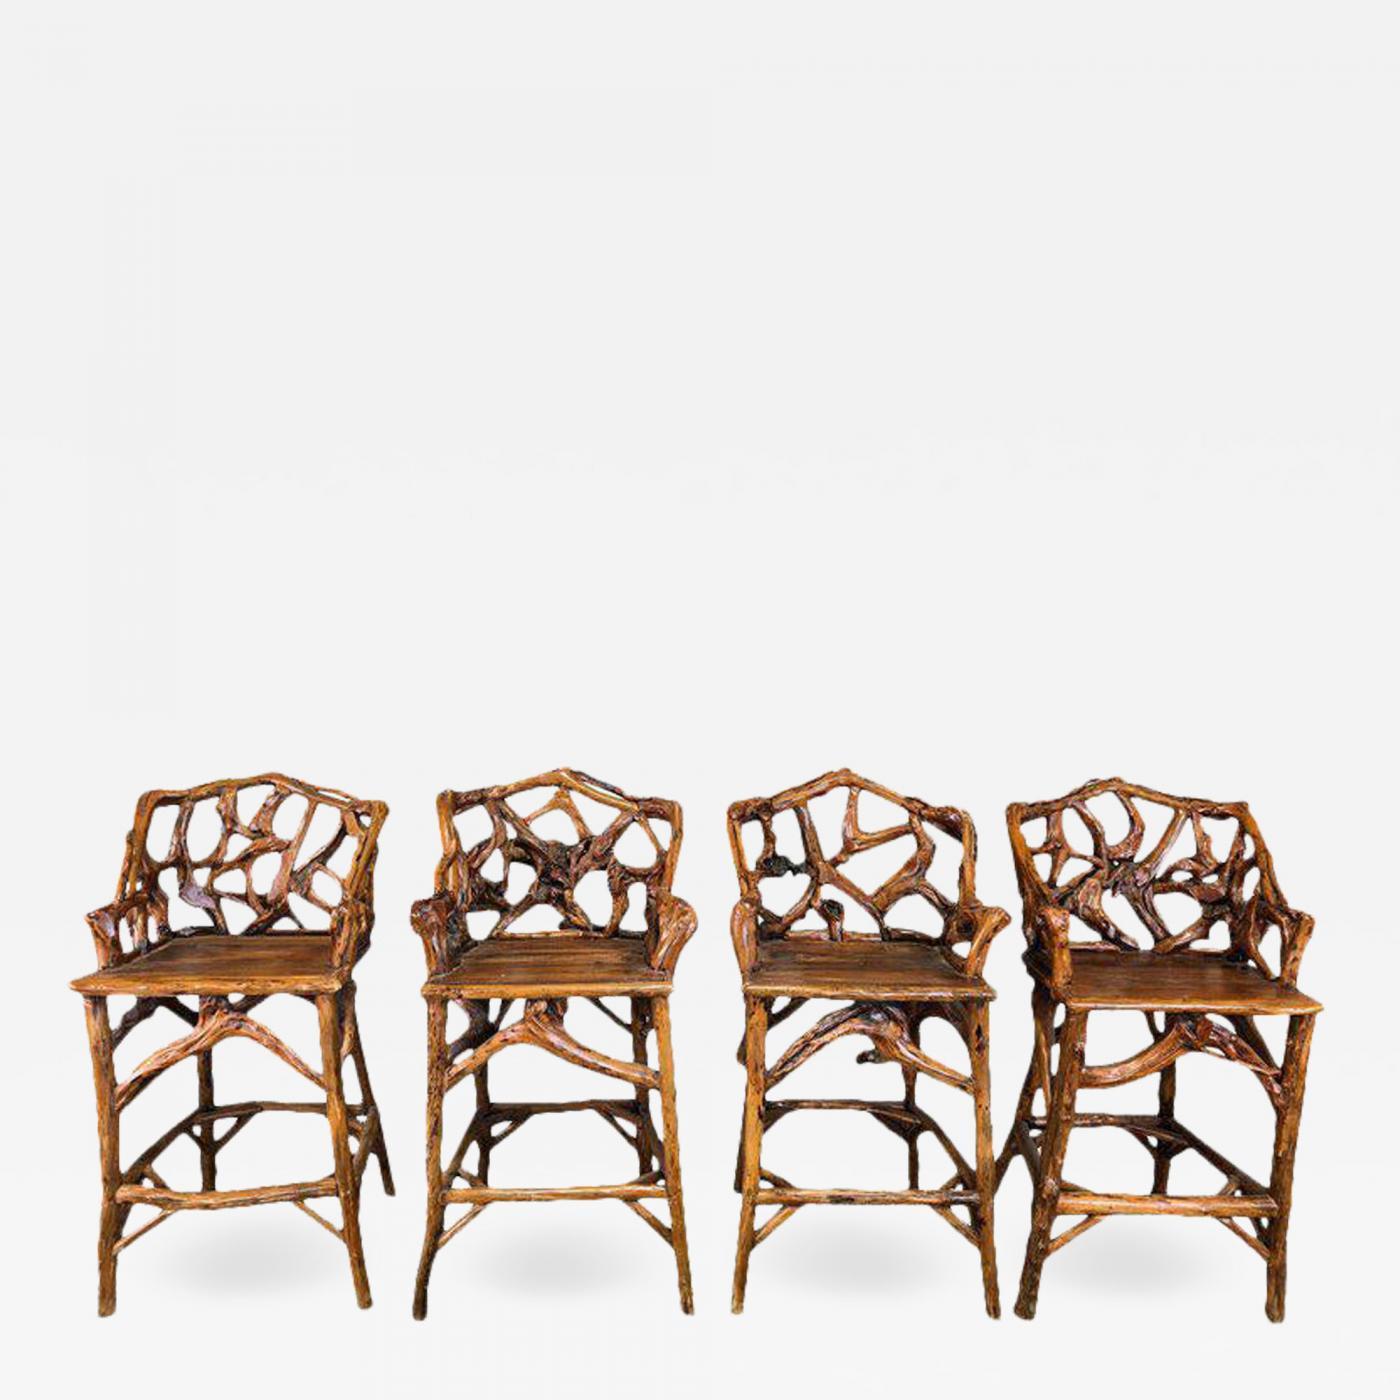 Image of: Mid Century Organic Modern Wood Bar Stools Set Of 4